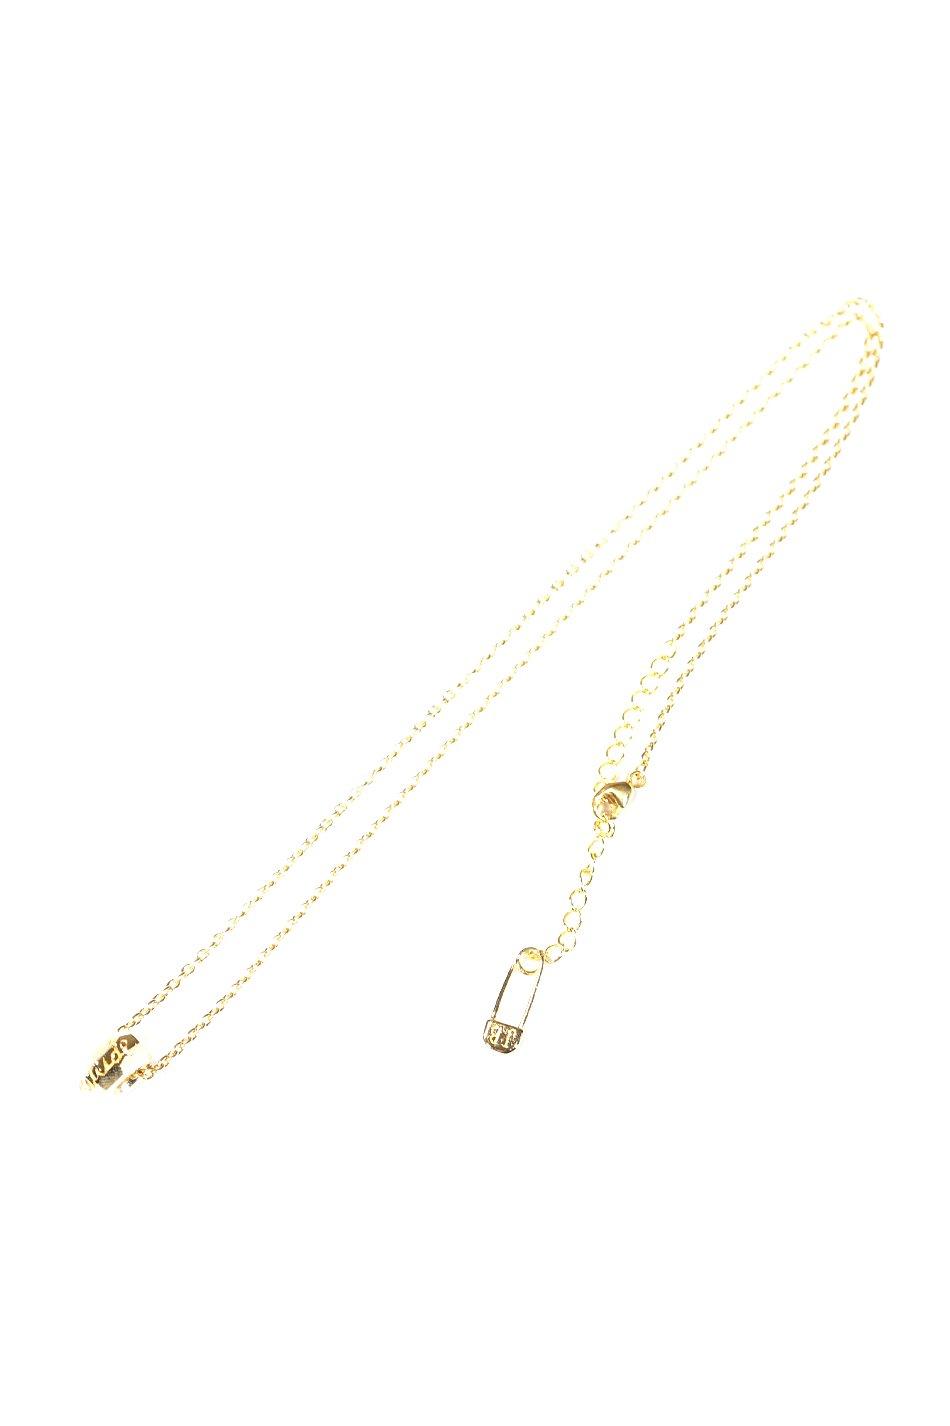 Cut Beads Necklace 14KGFLD